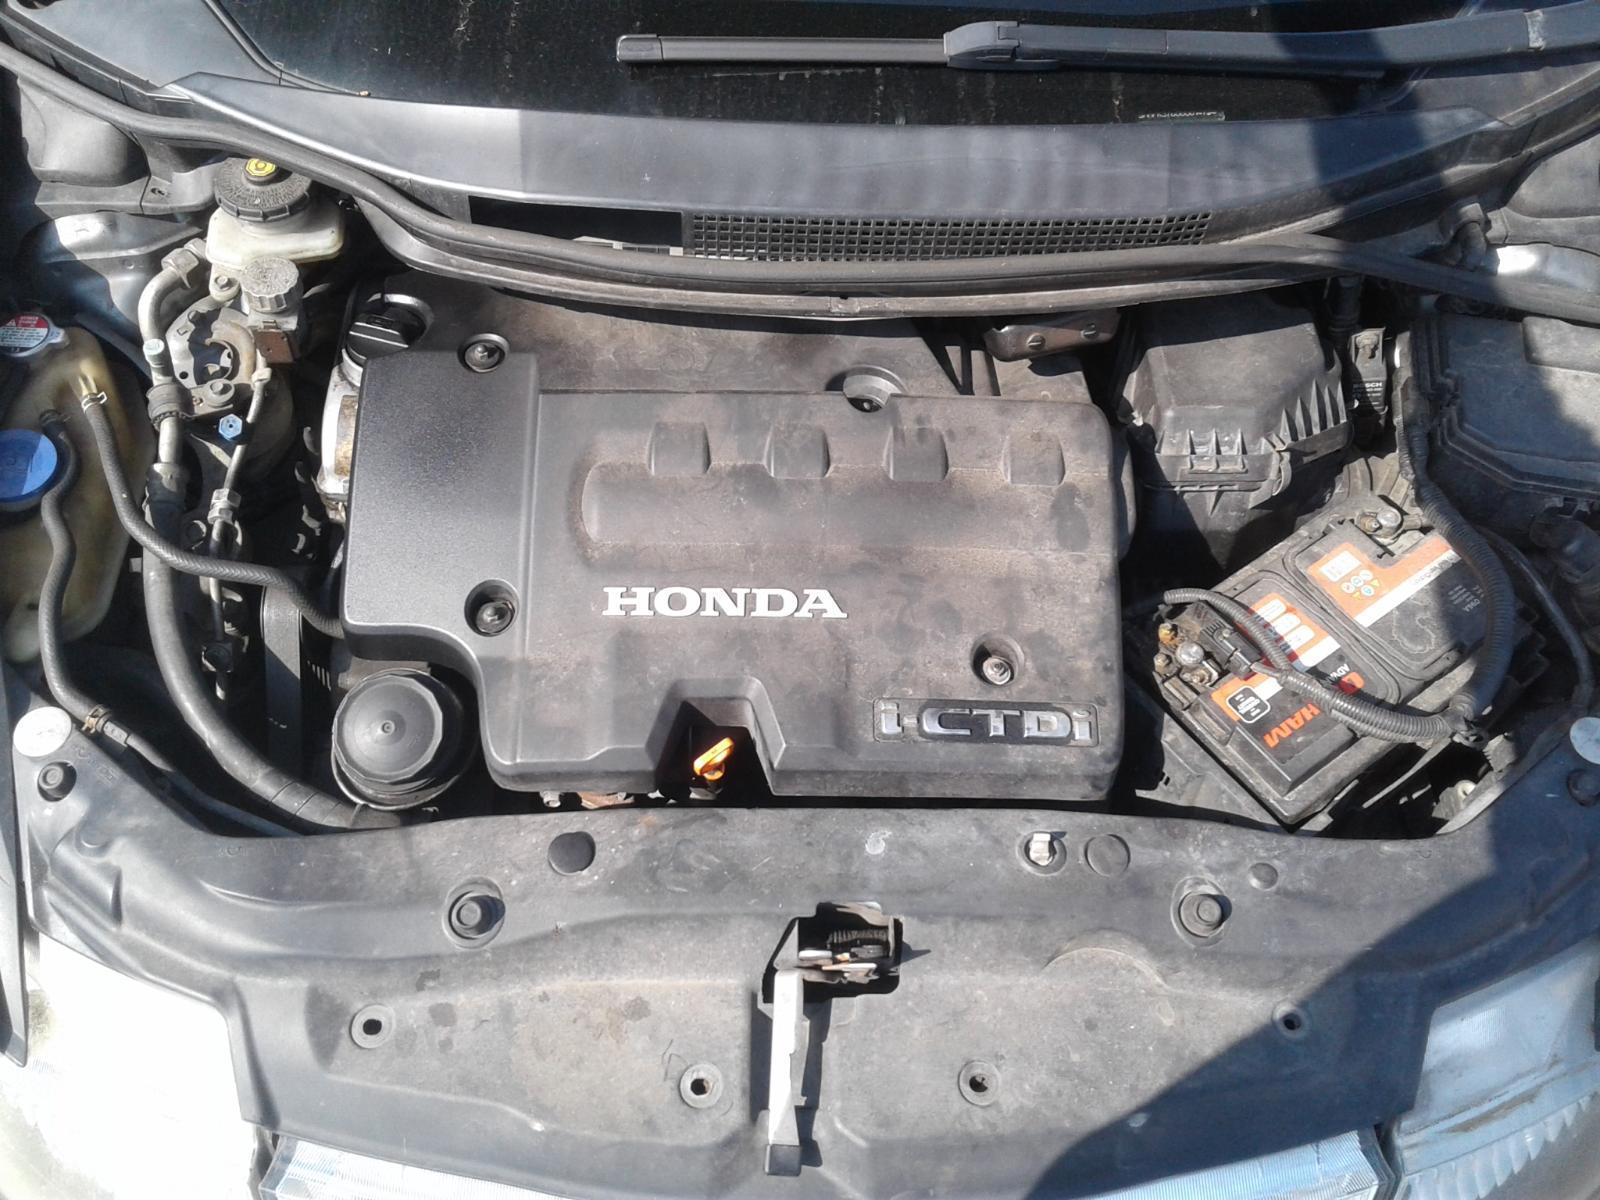 2006 HONDA CIVIC Image